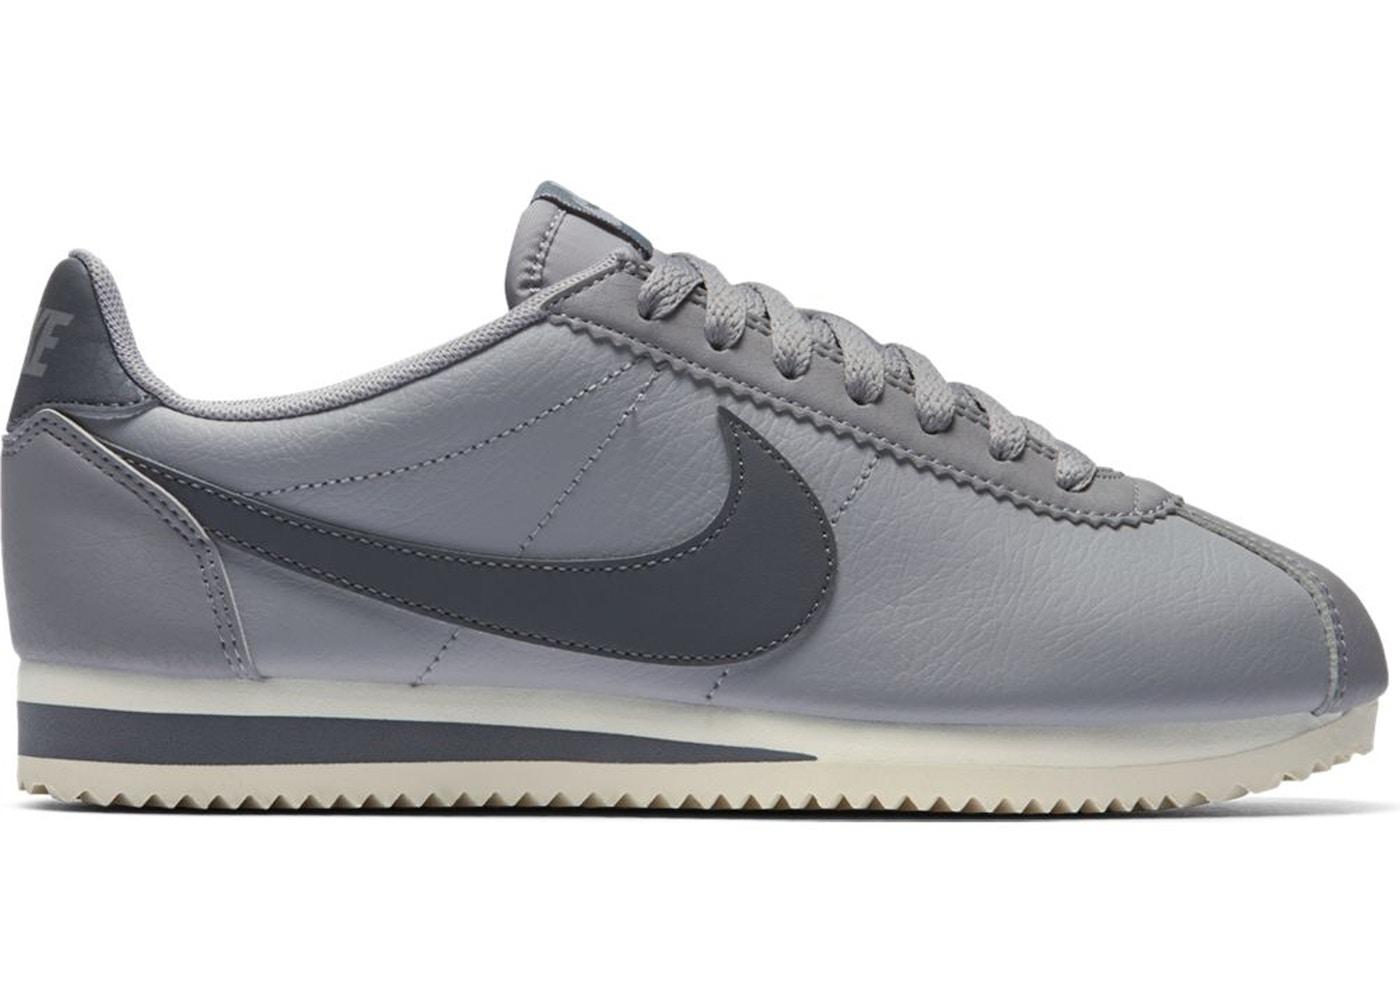 e41e5b8930 Nike Classic Cortez Leather Atmosphere Grey (W) - 807471-017